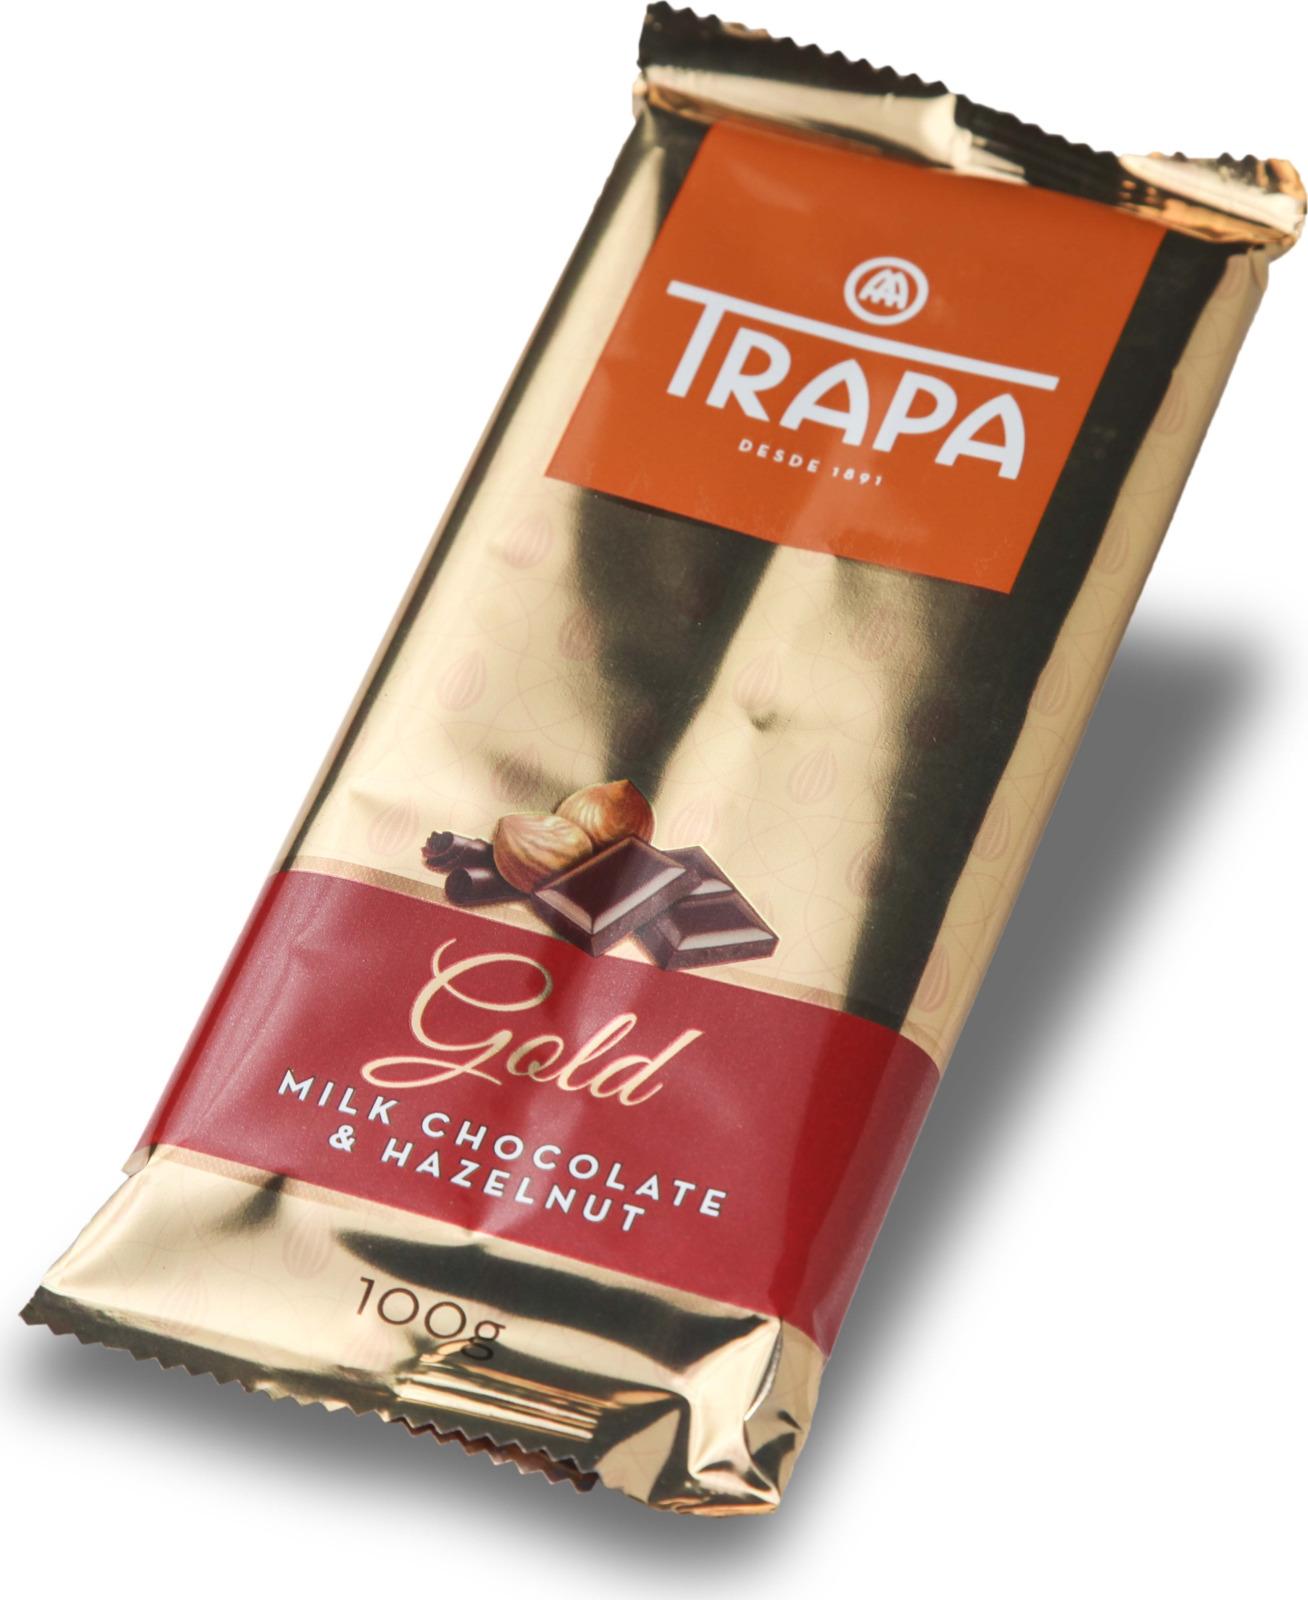 Молочный шоколад Trapa Gold Bar, с фундуком, 100 г спартак шоколад молочный 500 г